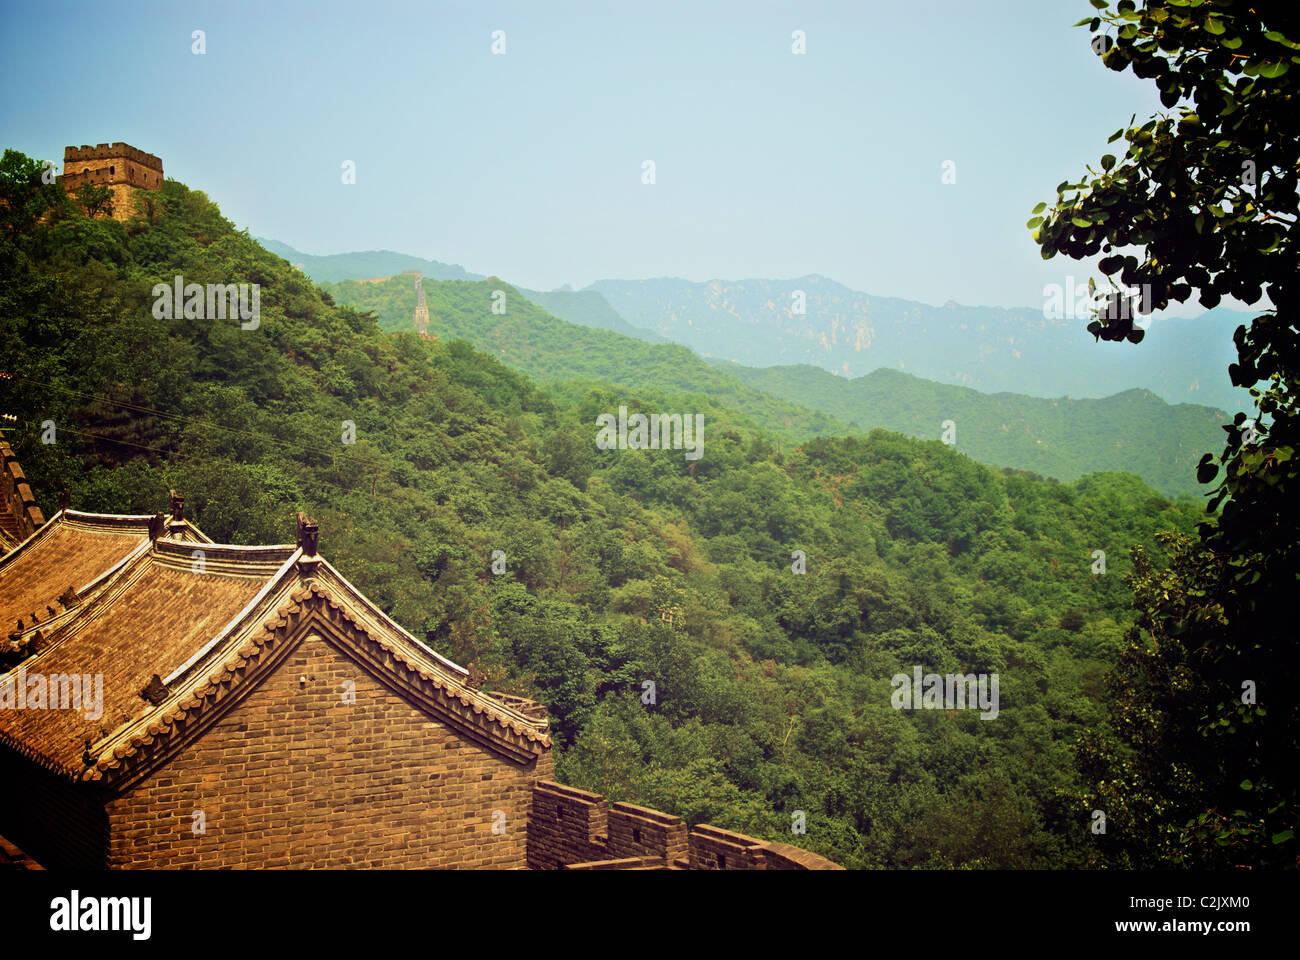 Gran Muralla China Imagen De Stock